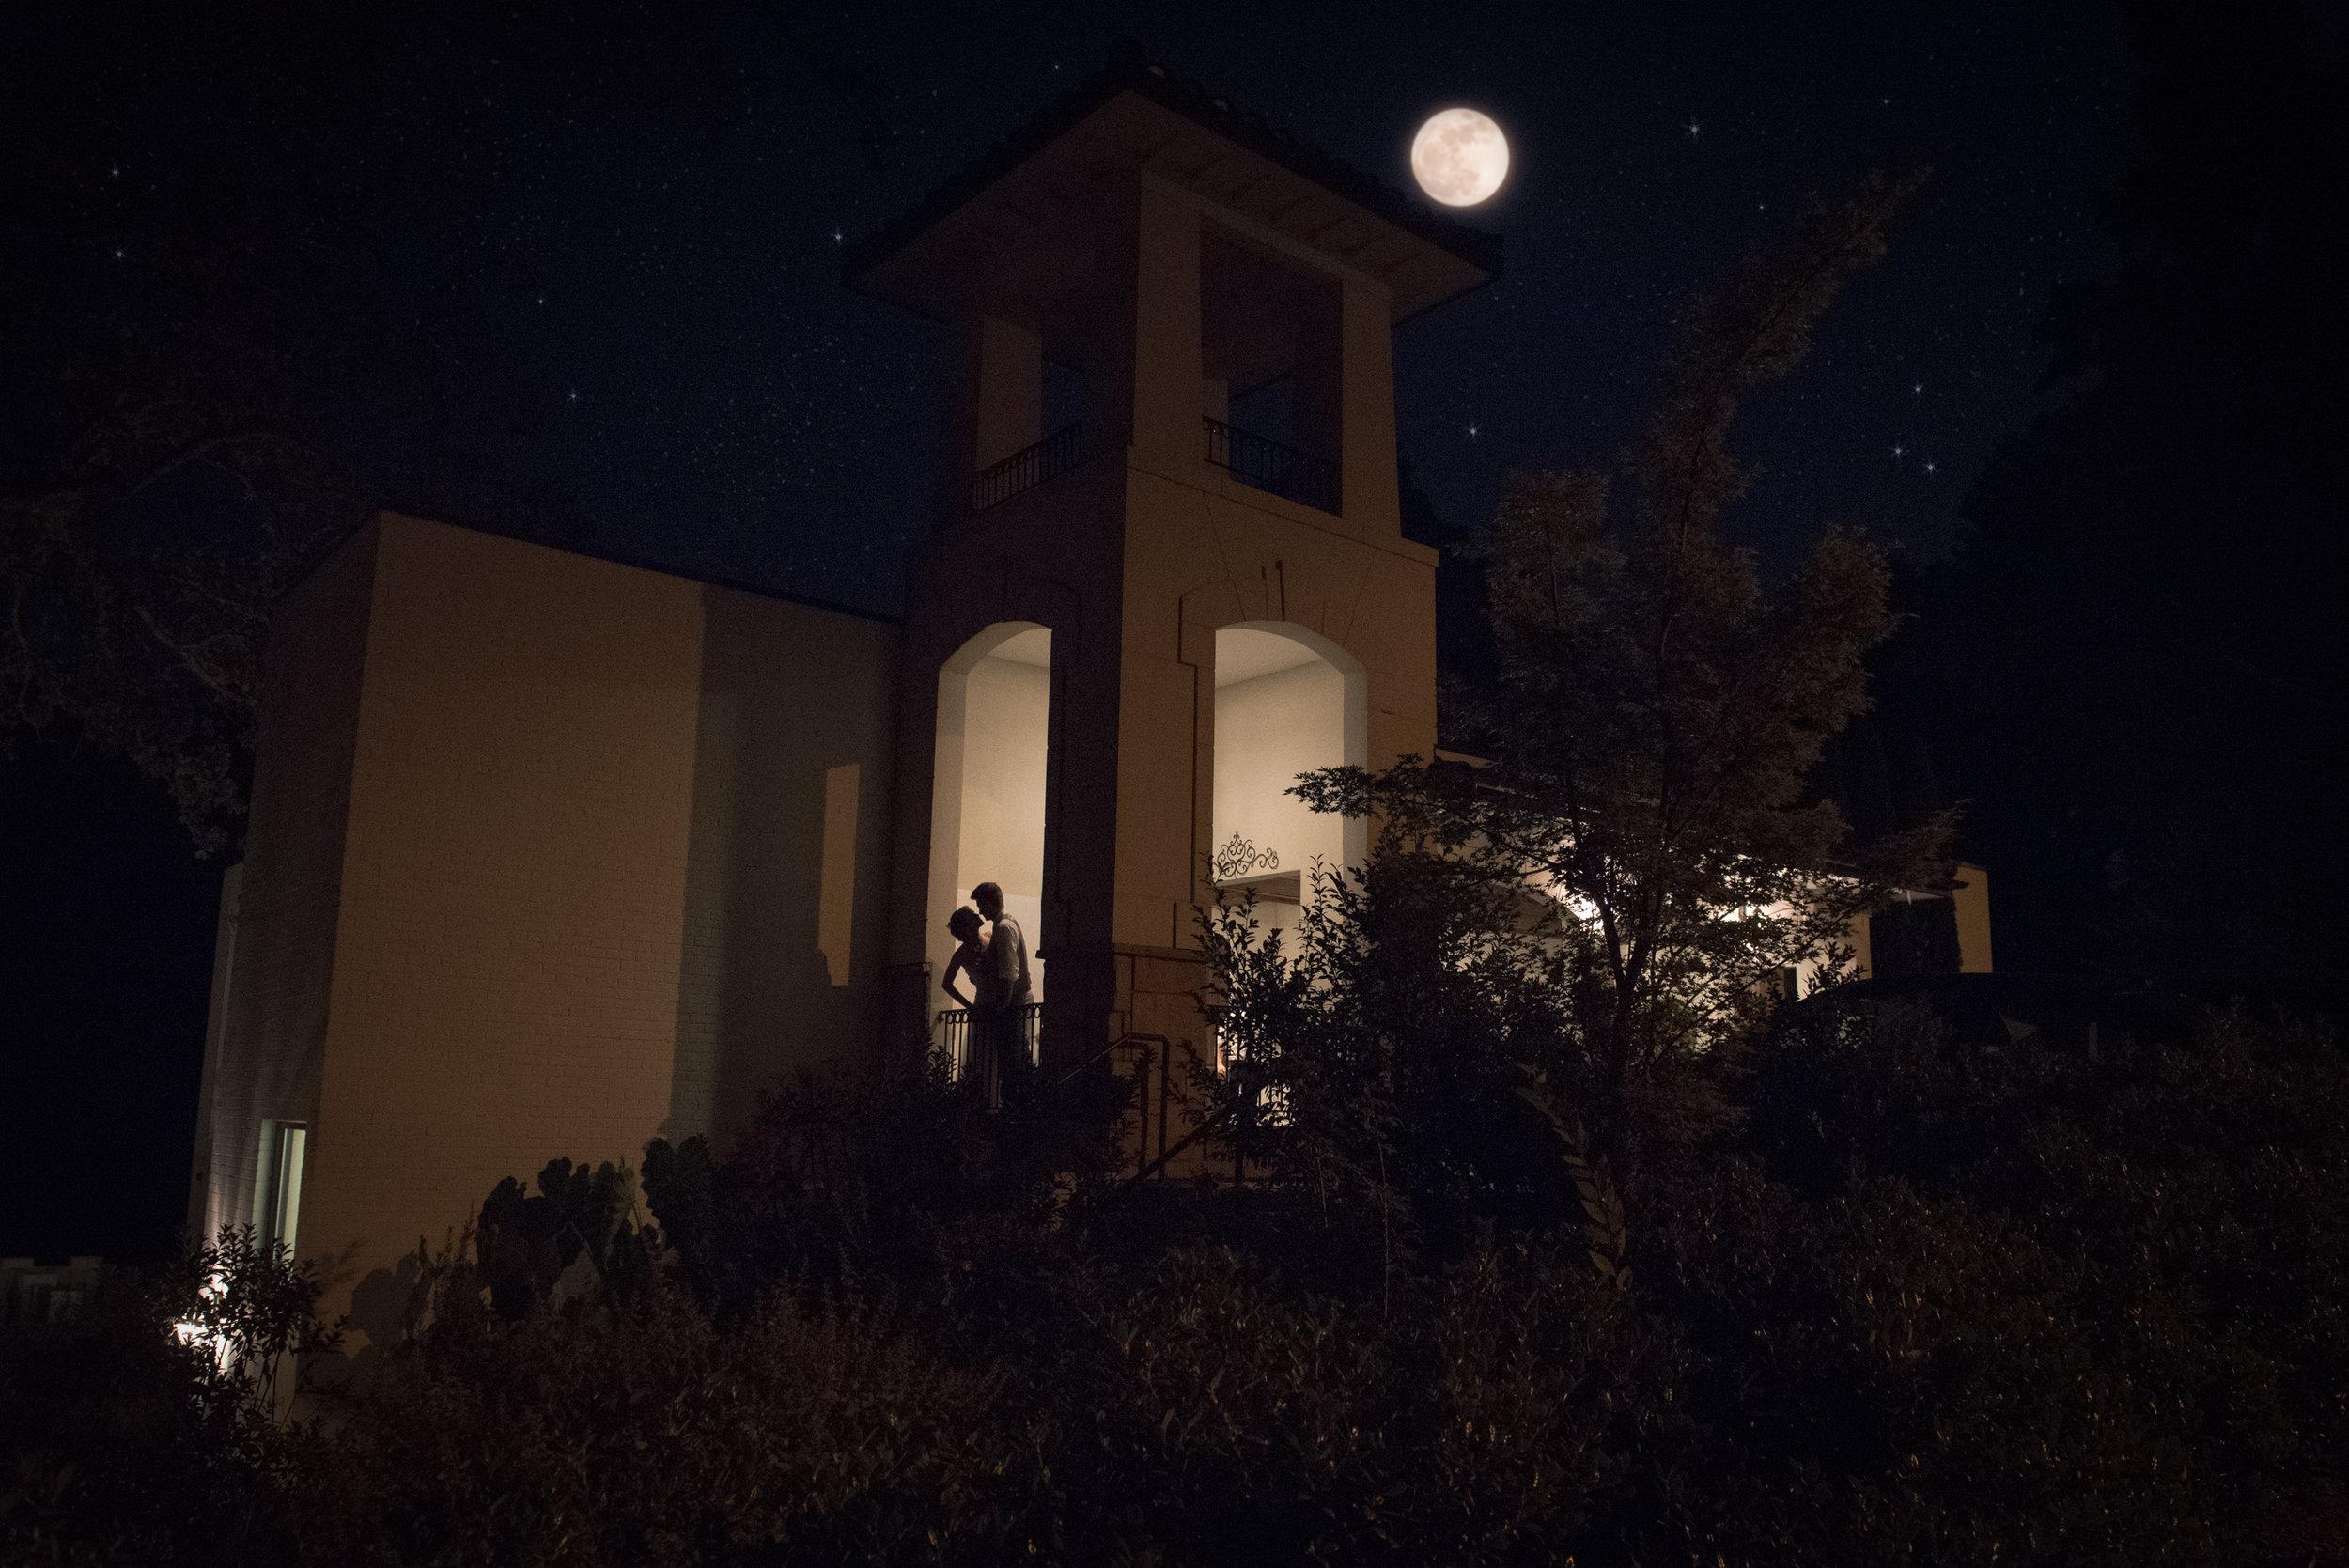 Vizcaya Villa Wedding Photography, Fayetteville, Fort Bragg, NC | By Yuliya Panchenko